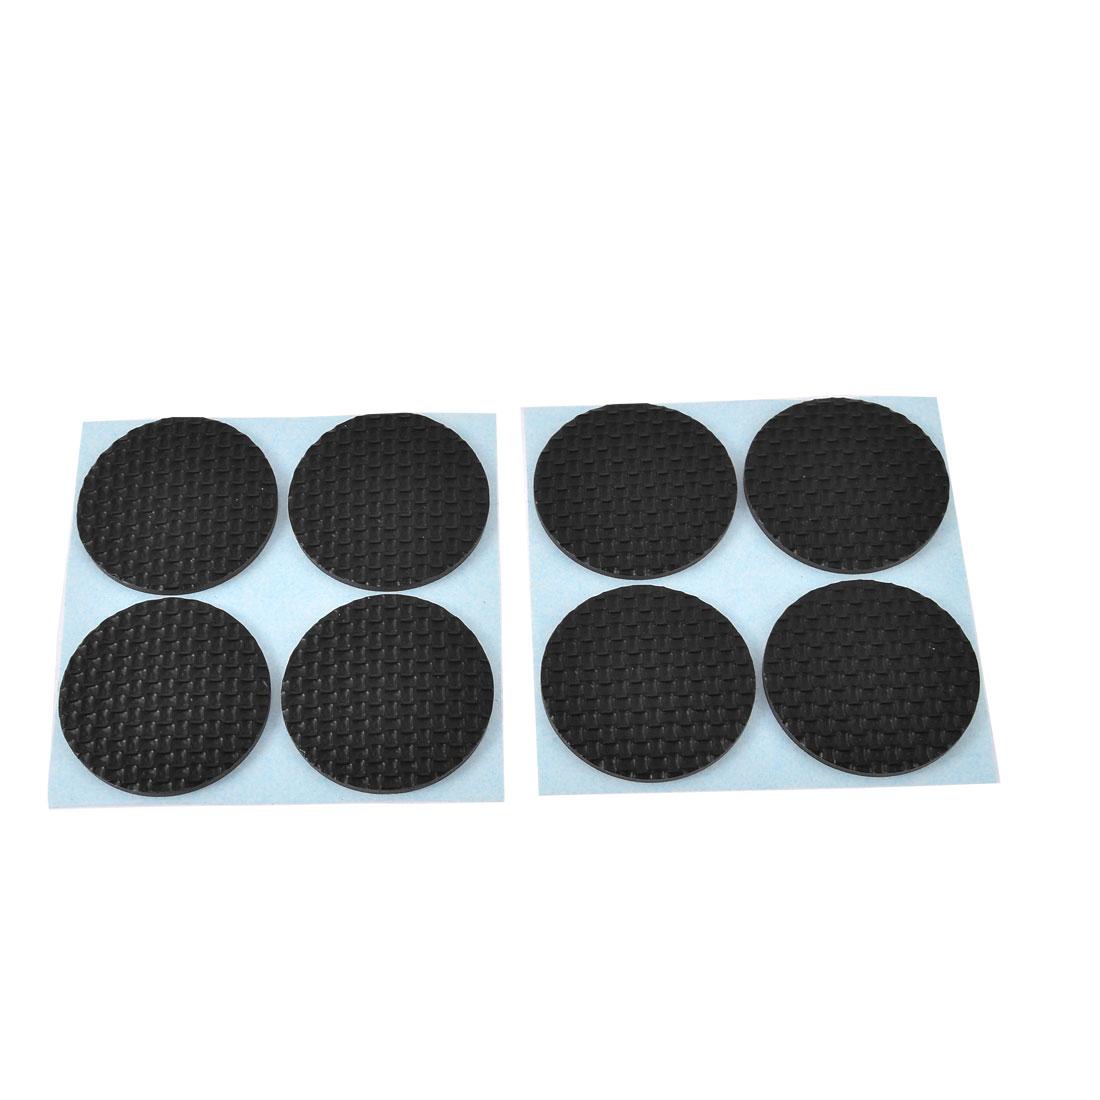 Home Nonslip Round Shaped Furniture Feet Protection Pad Cushion Mat Black 8pcs